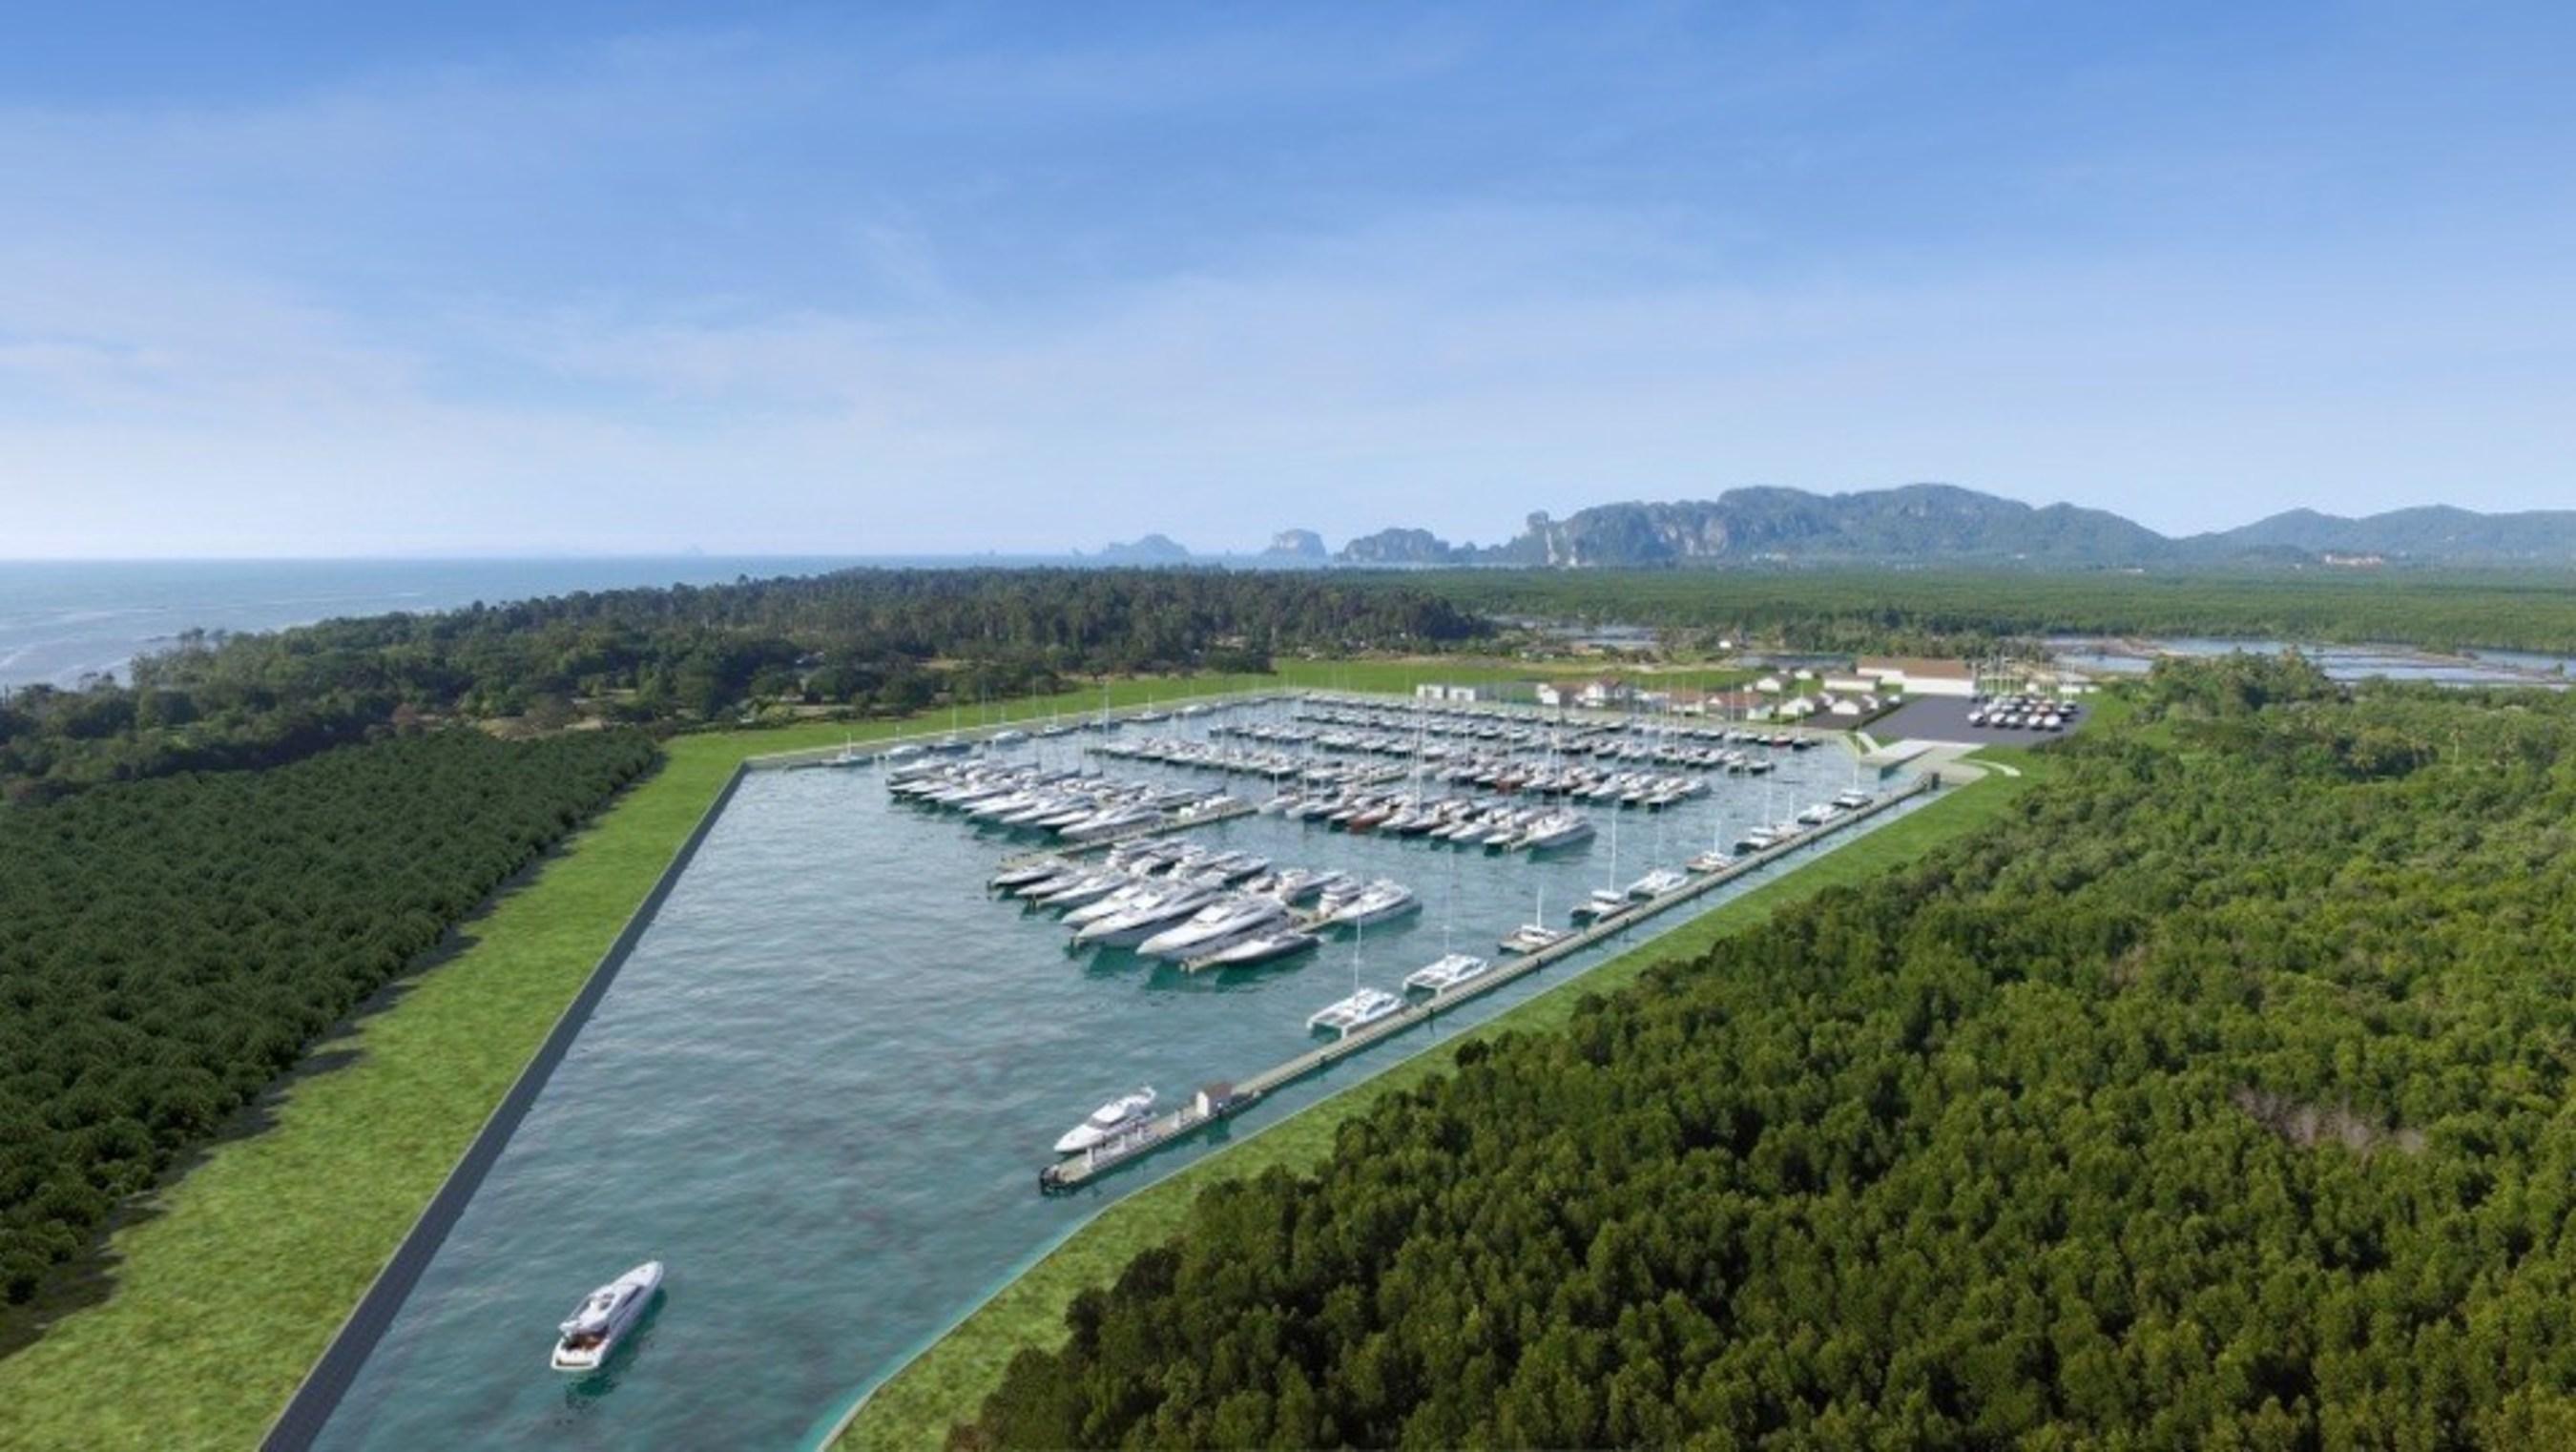 Port Takola, Thailand's New Yacht Marina, to Open Its 1st Phase in May 2016